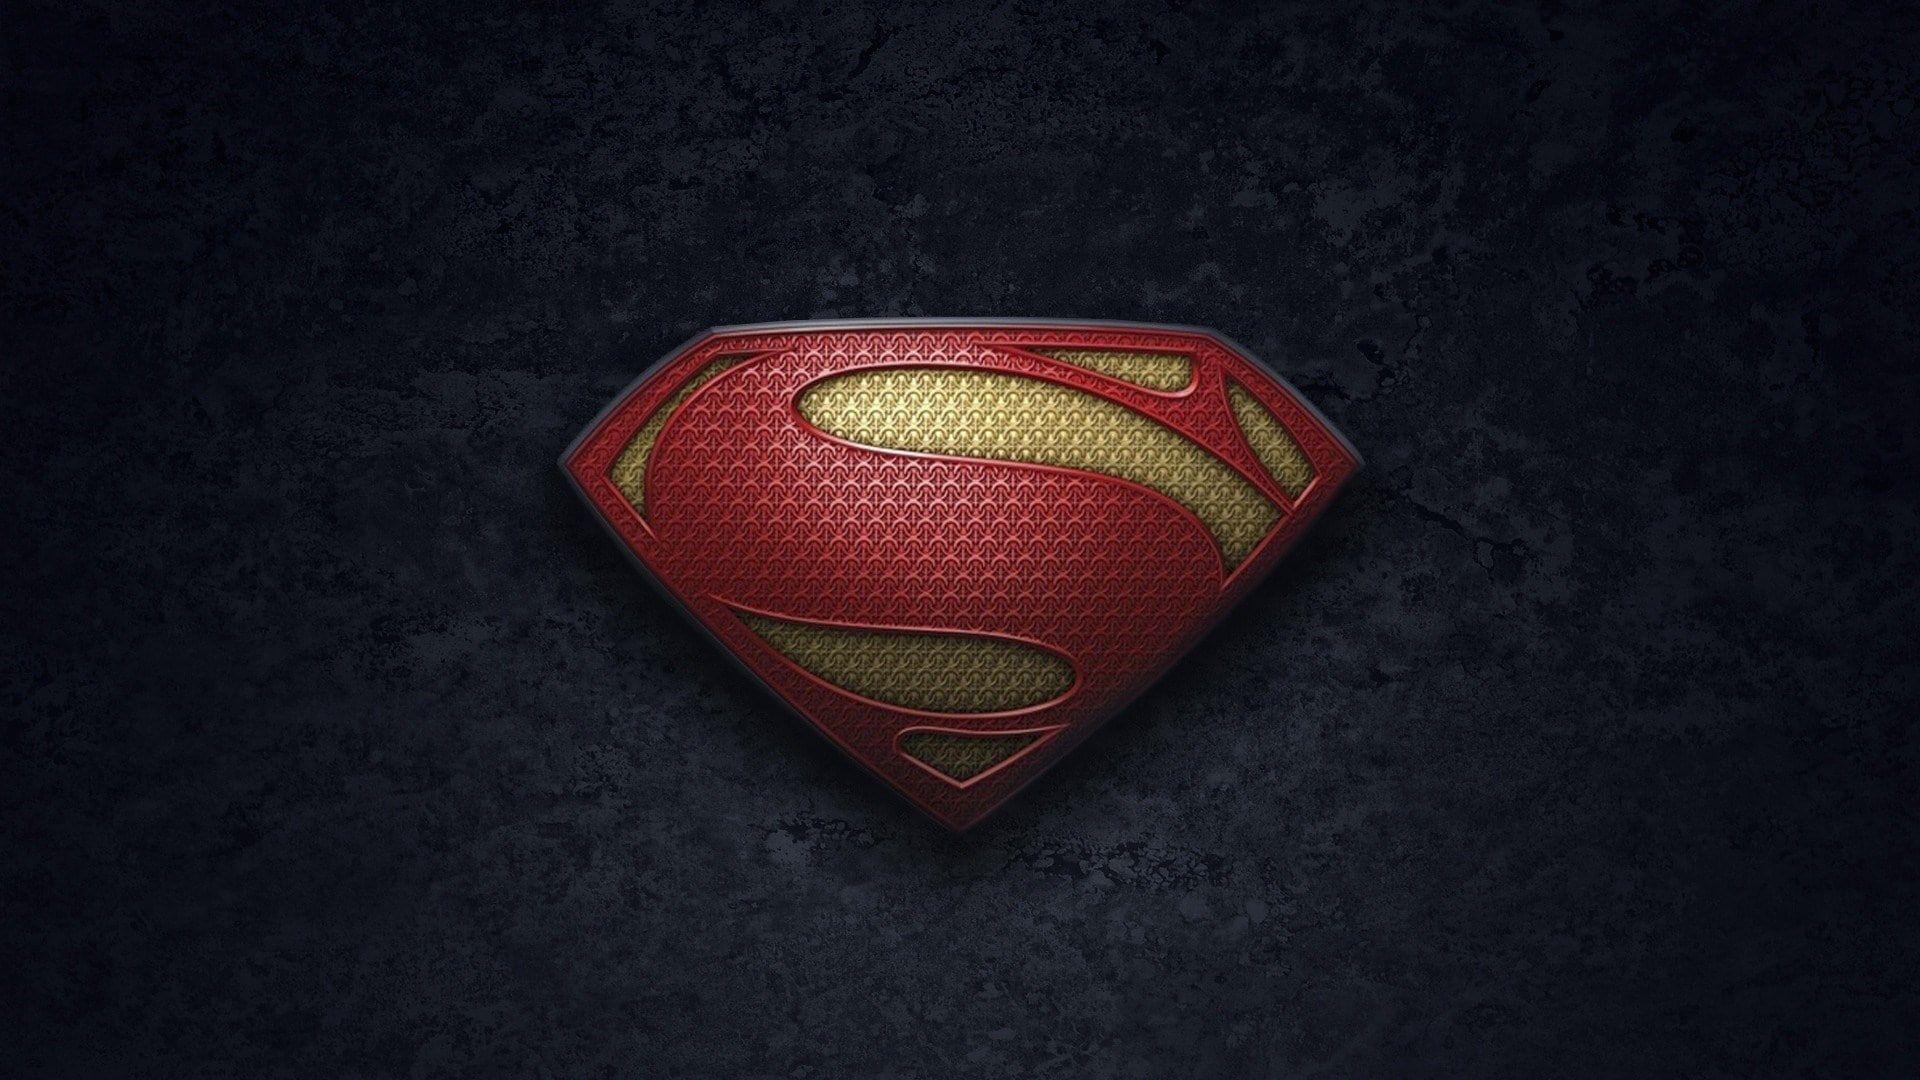 Superman Logo Dark Background Superman Logo Dark Background 1080p Wallpaper Hdwallpaper De In 2021 Superman Wallpaper Superman Wallpaper Logo Logo Wallpaper Hd Dark superman logo hd wallpaper for